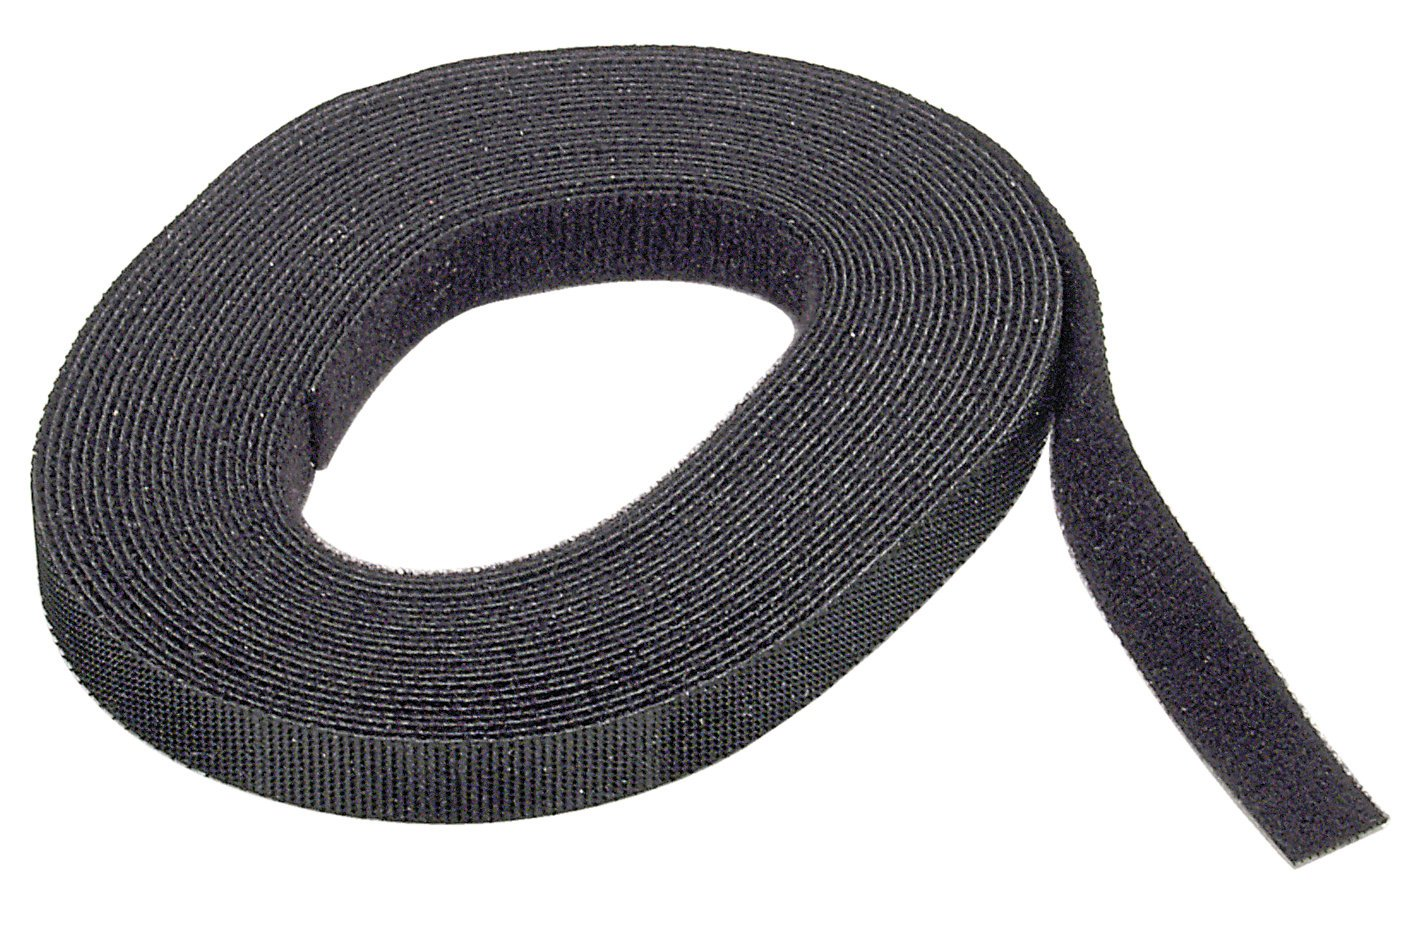 Wolfcraft 3286000 3286000-1 Tiras adherentes de Velcro Negras para la casa